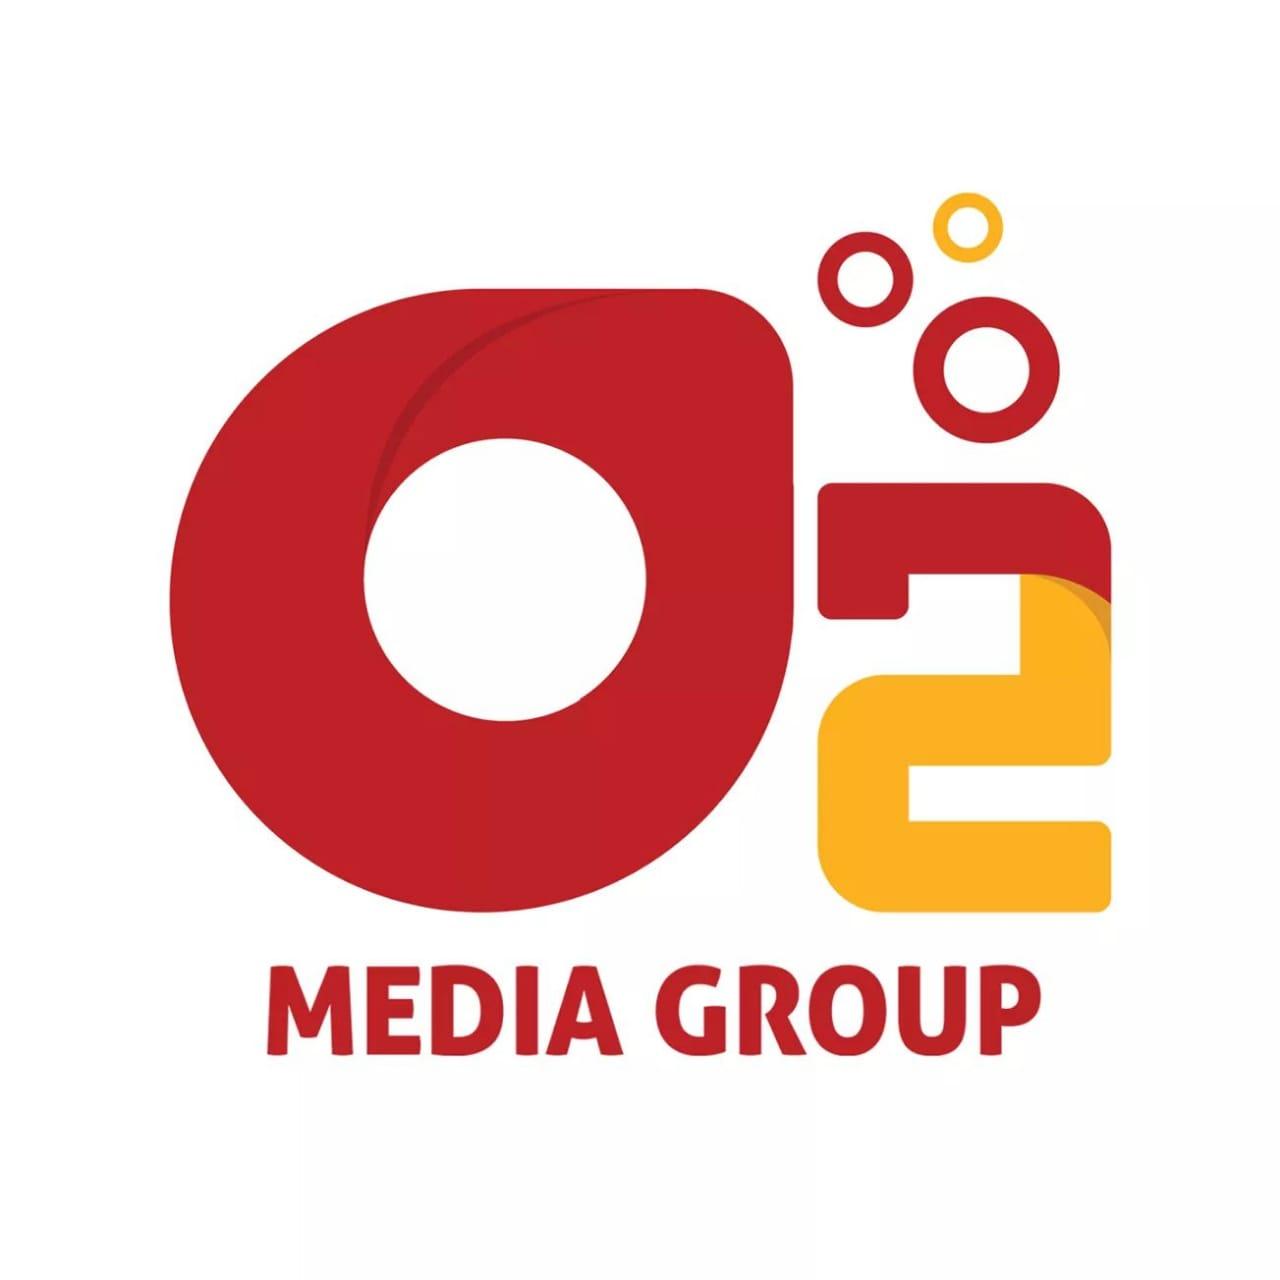 O2 Media Group